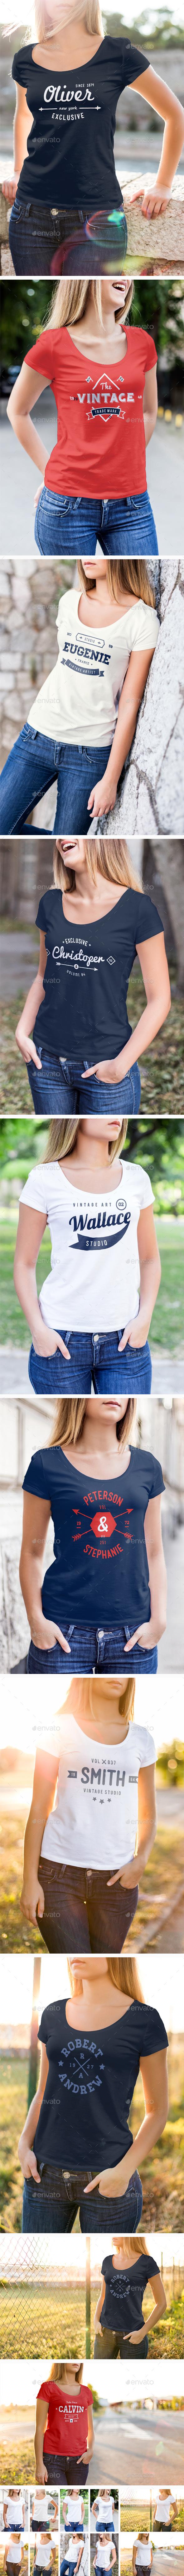 T-Shirt Mock-Up Female Model Edition